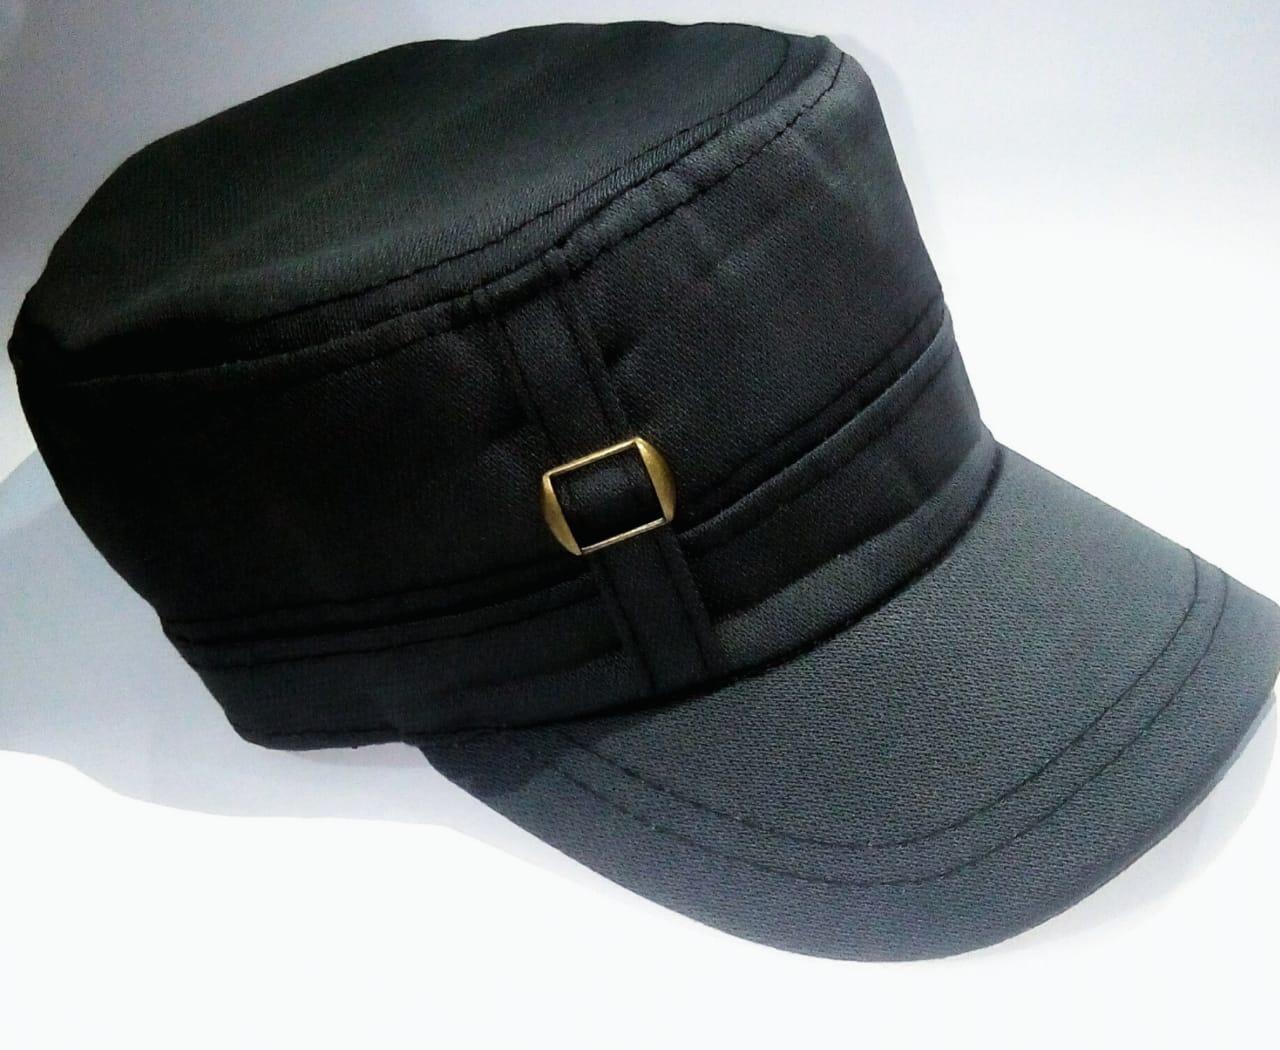 cb5f3588 Buy Mens Caps & Hats @ Best Price in Pakistan - Daraz.pk